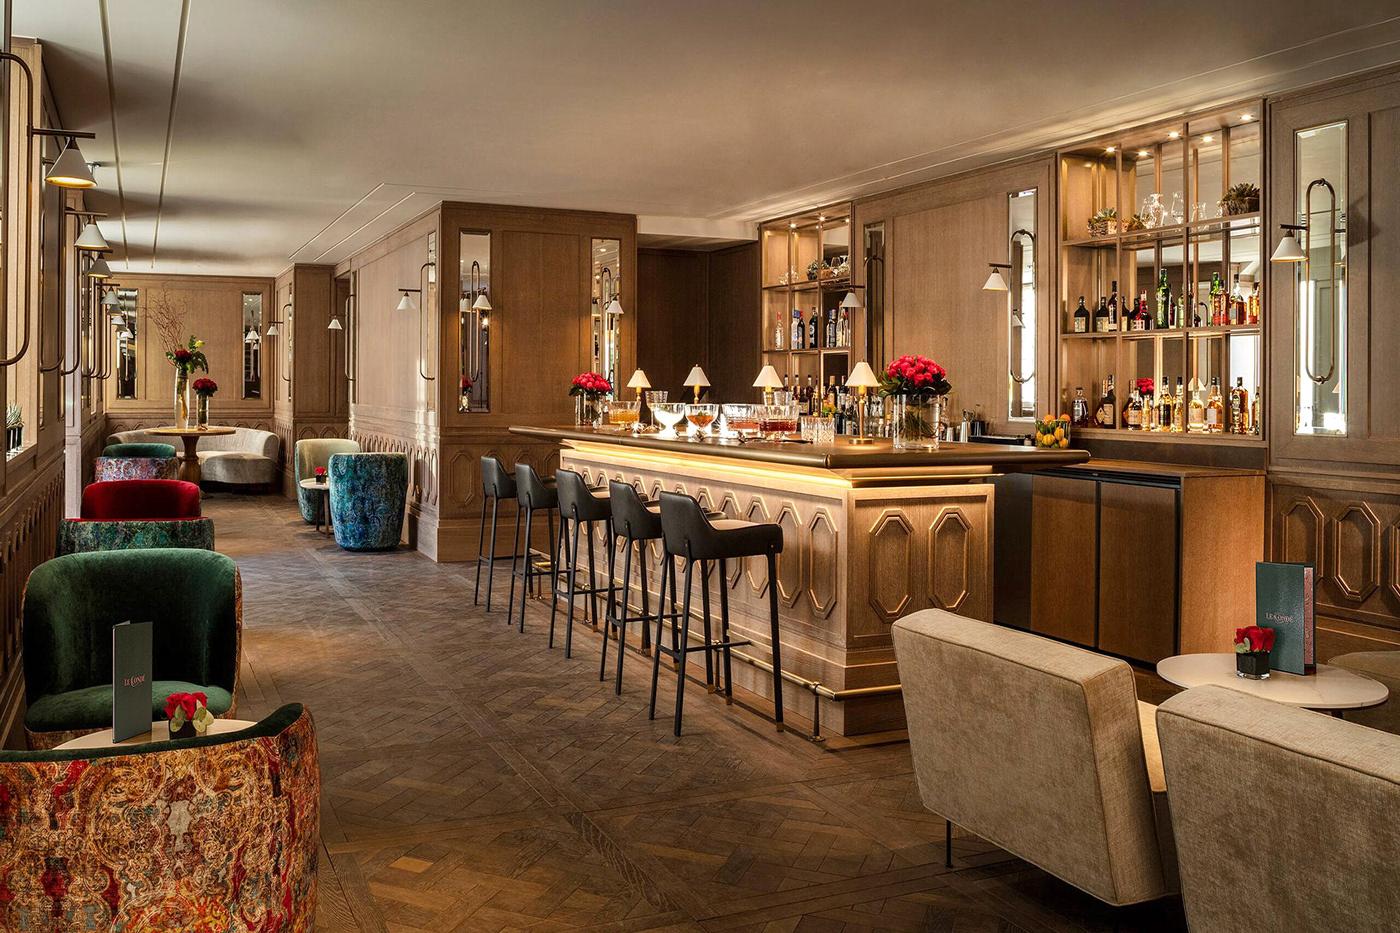 F&B hotel bar restaurant drink menu alcohol cocktail logo pink